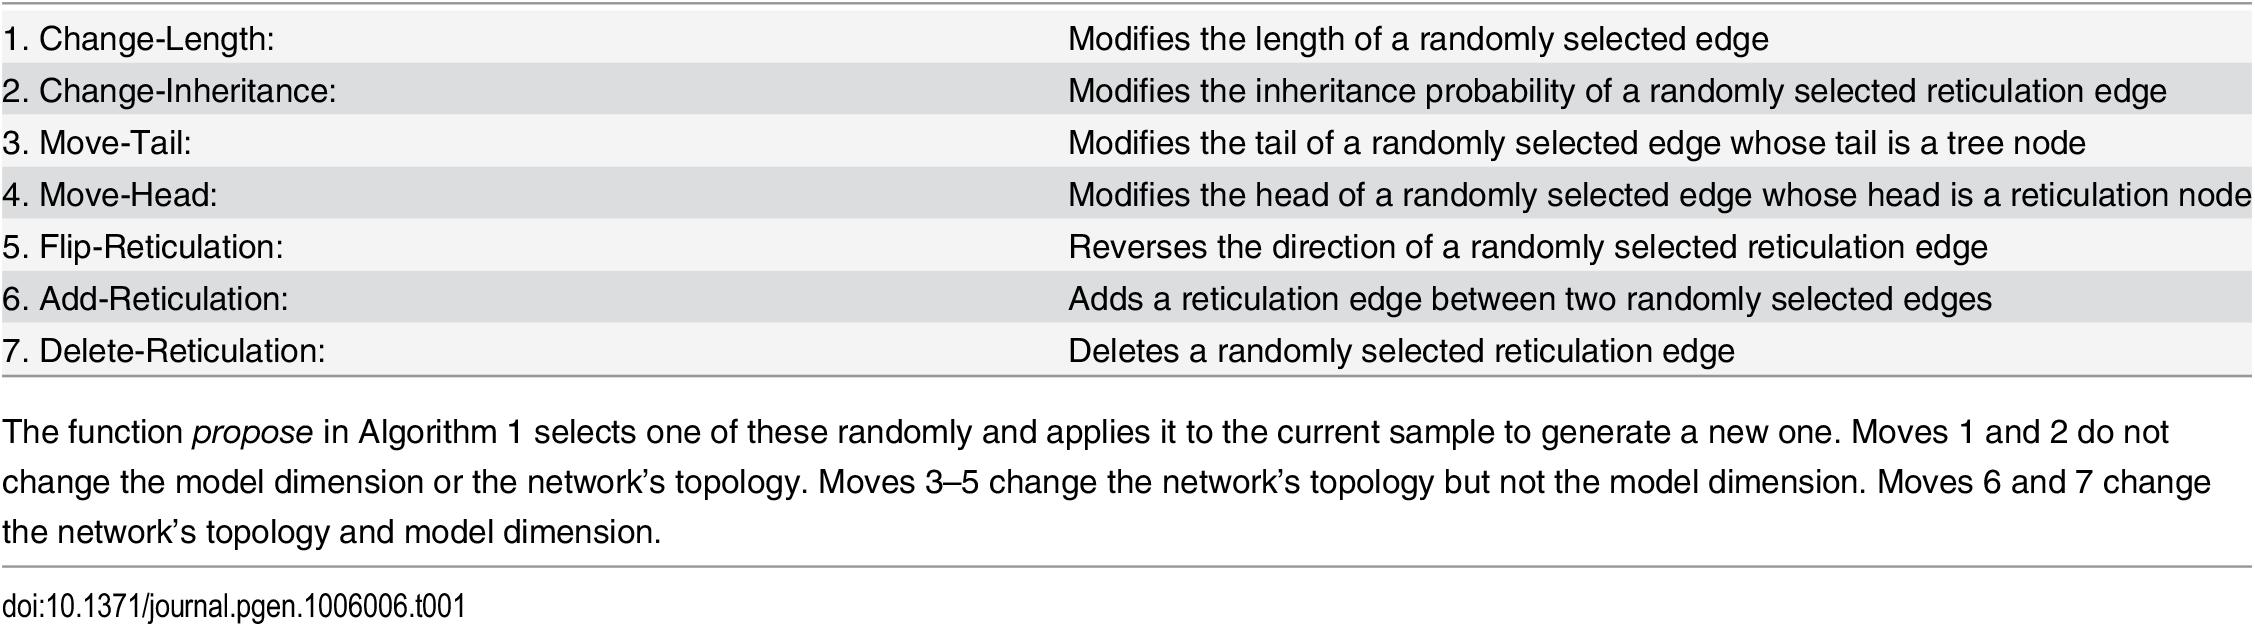 The 7 moves that the Metropolis-Hastings algorithm employs.